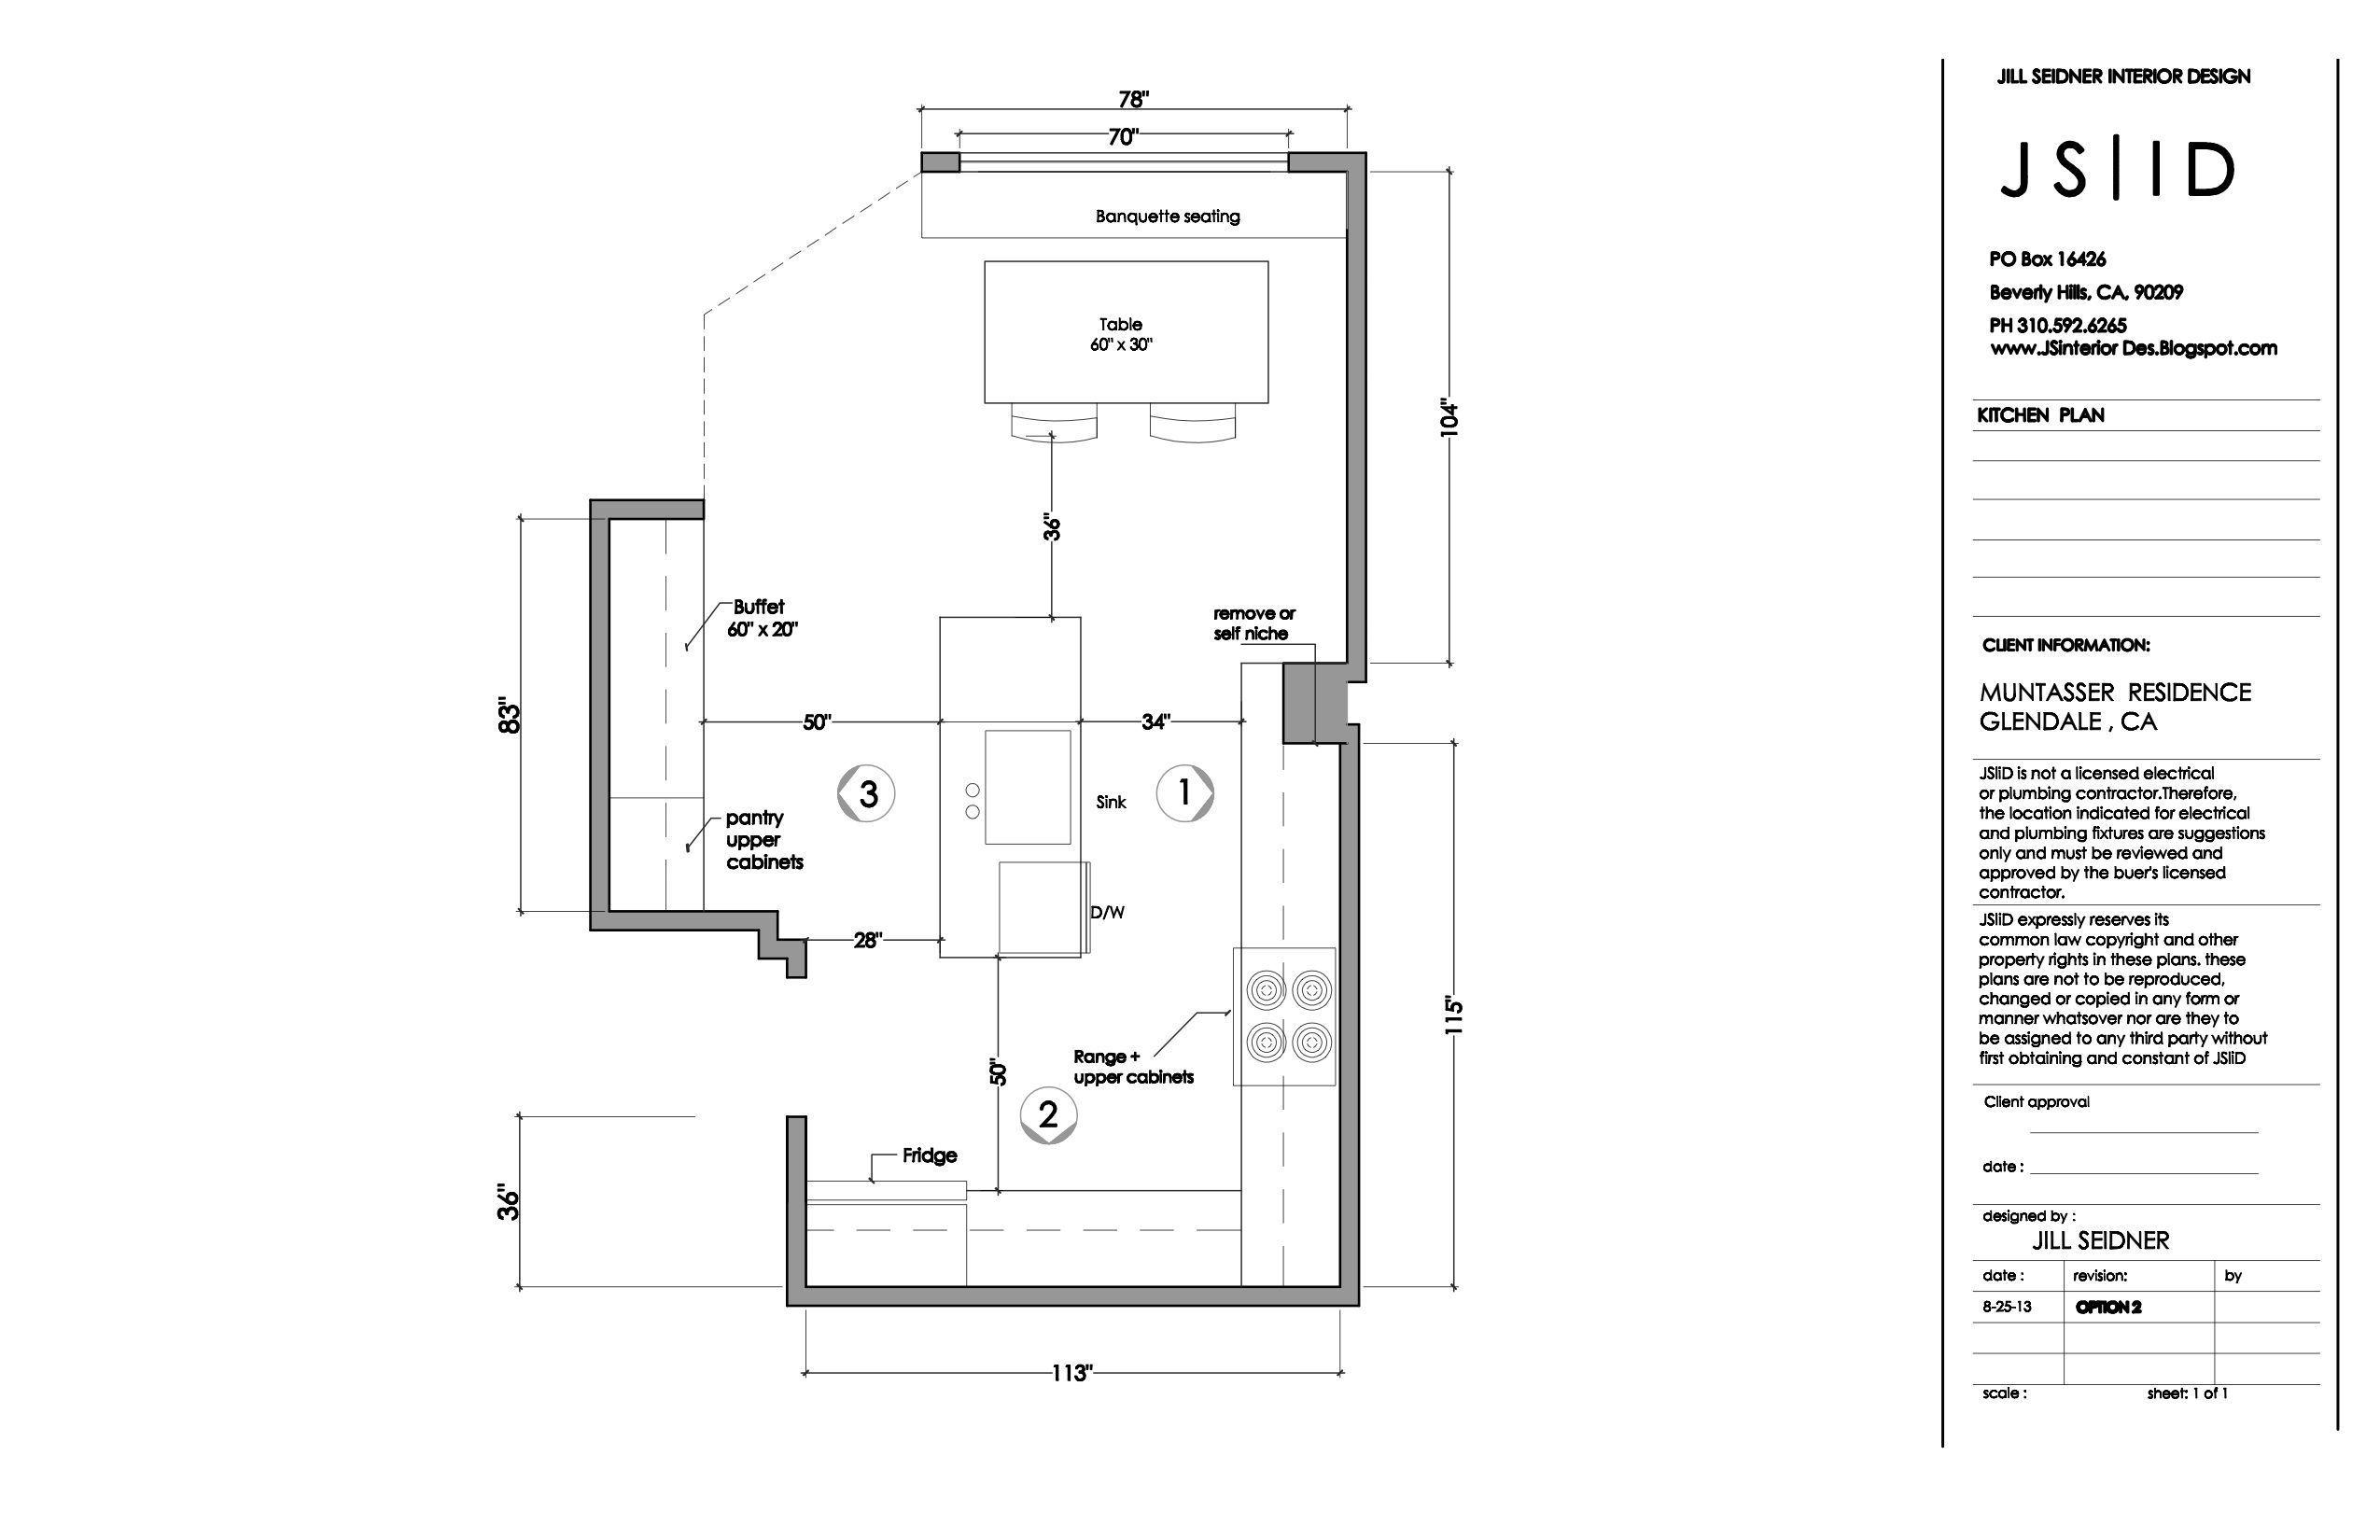 Glendale, CA Residence Kitchen Remodel Plan, Revised. www ...